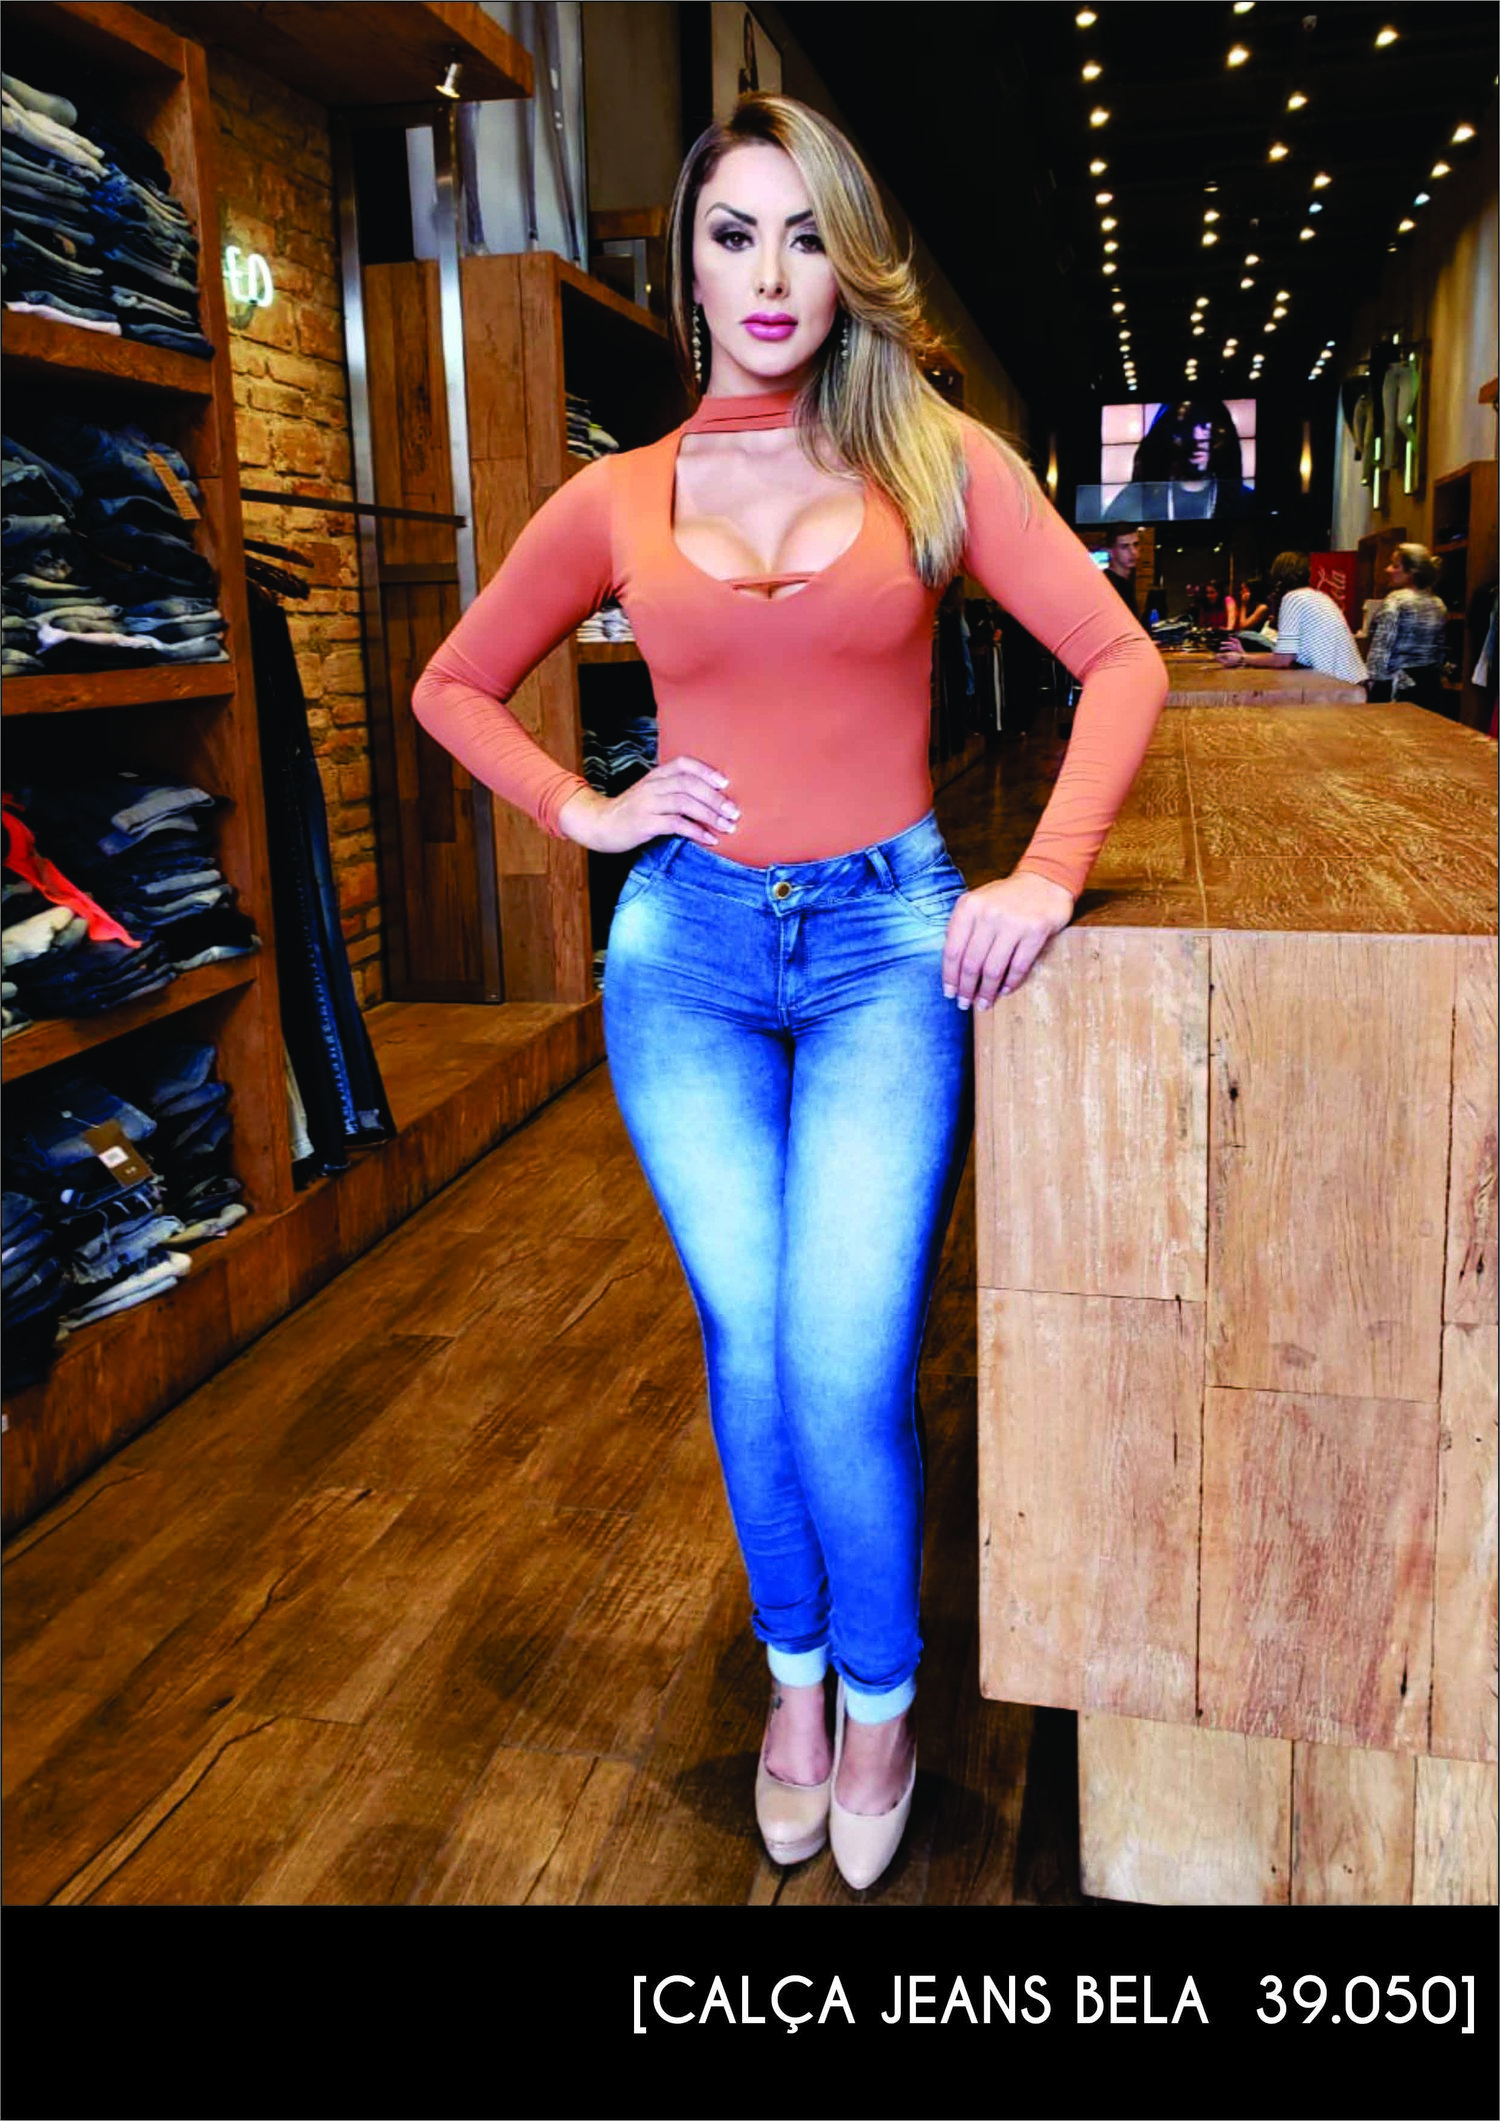 Calça Darlook Jeans Bela ref. 39050